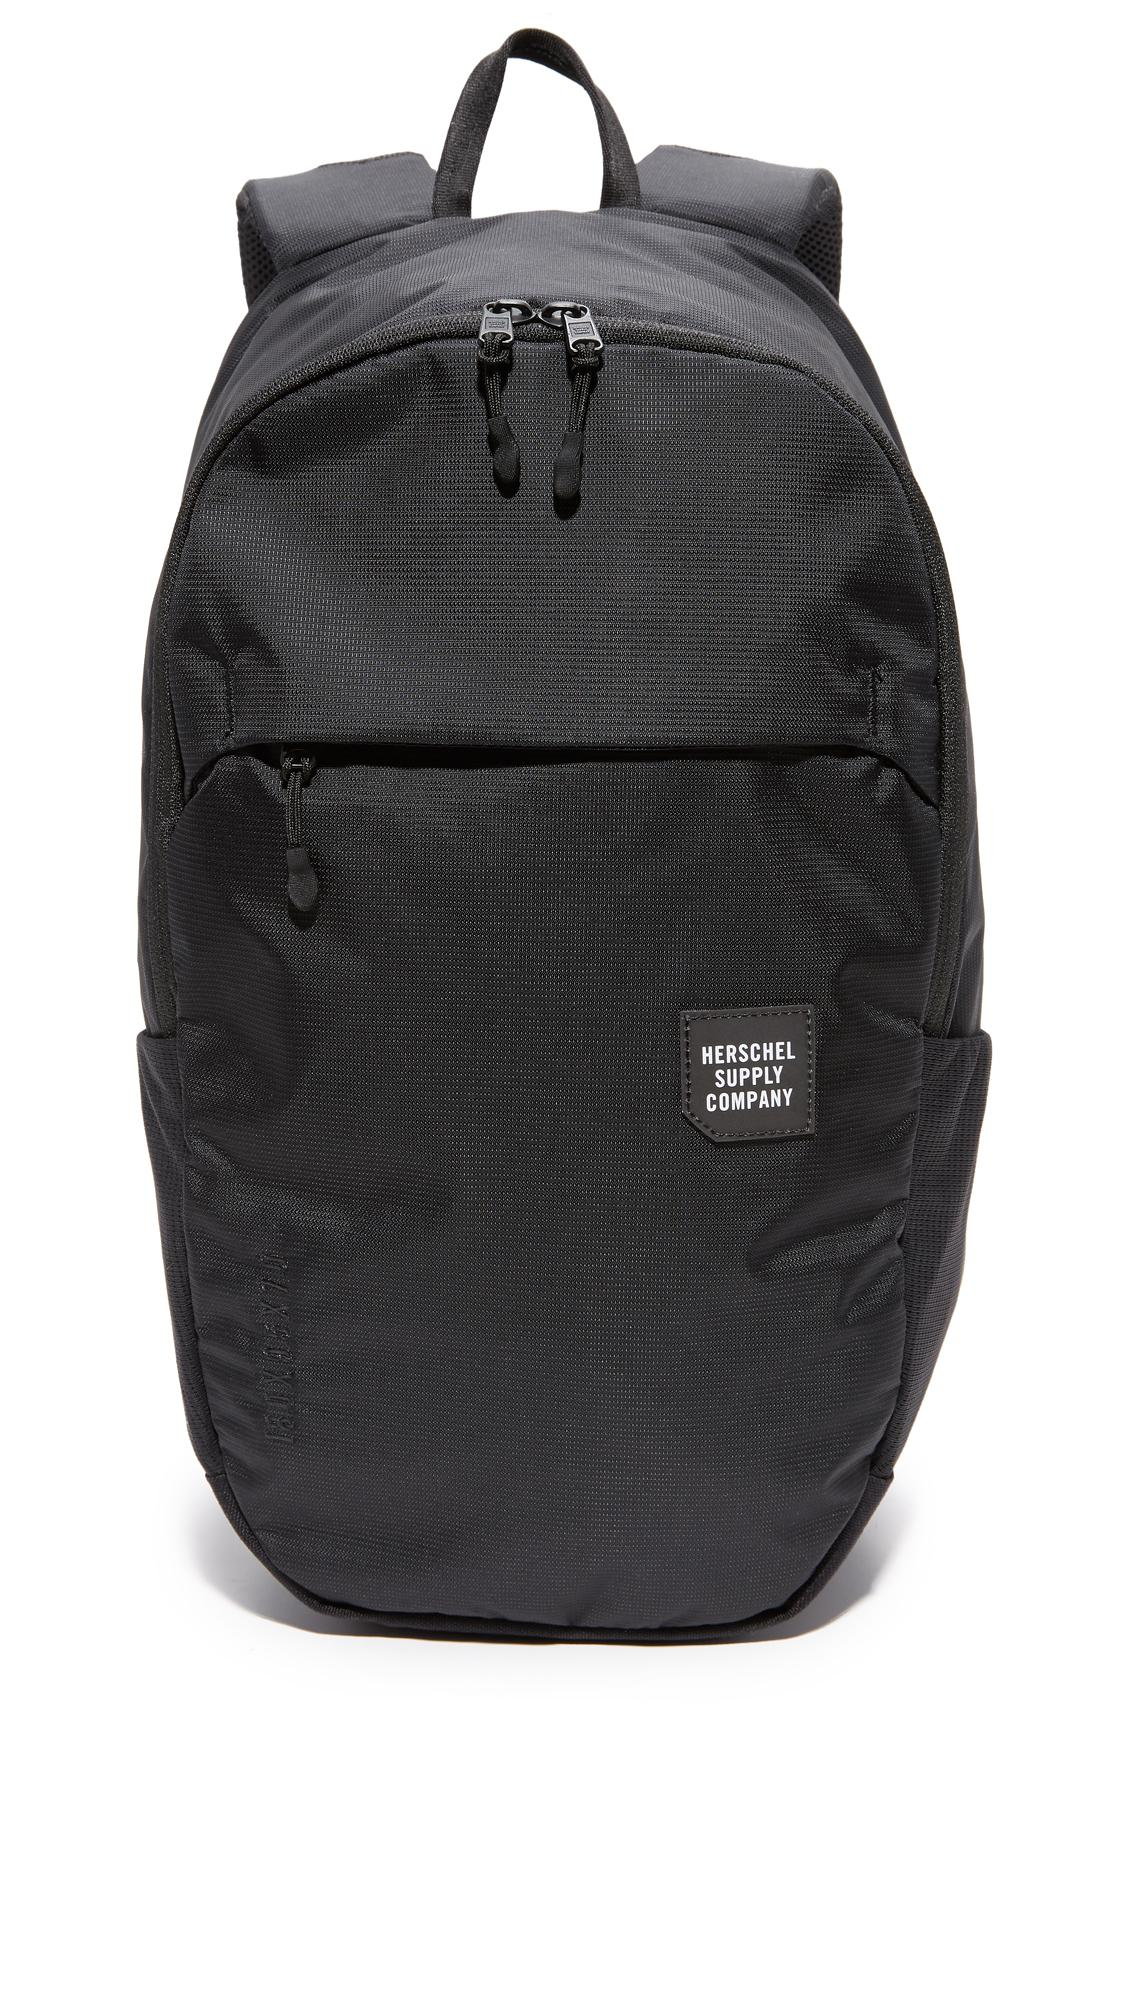 e48a23cb0d0 Herschel Supply Co. Trail Mammoth Medium Backpack in Black for Men ...